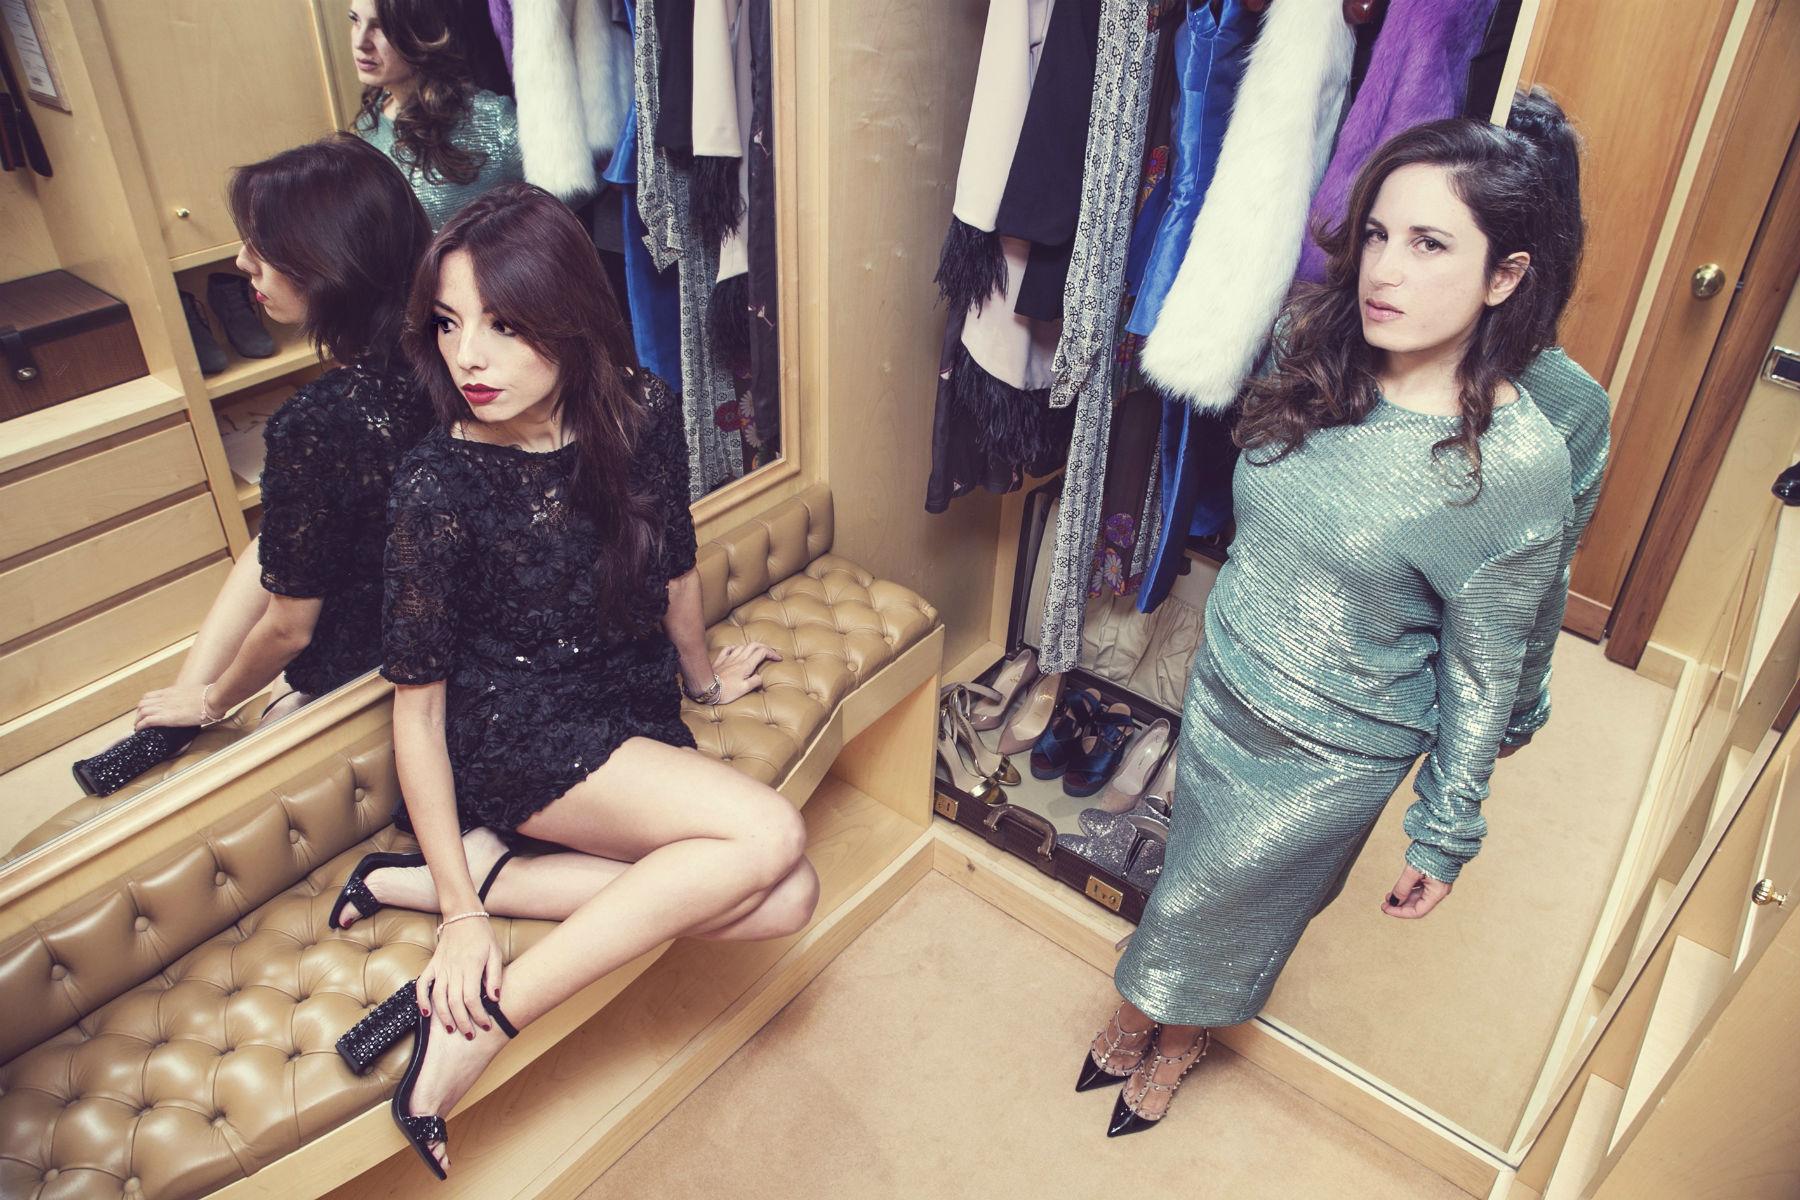 theladycracy.it, elisa bellino, fashion blogger italiane, party dress 2015, look capodanno idee, giovanna nicolai, rome cavalieri hotel,sfilate di moda, idee look capodanno, rome cavalieri waldorf astoria, fashion blogger famose